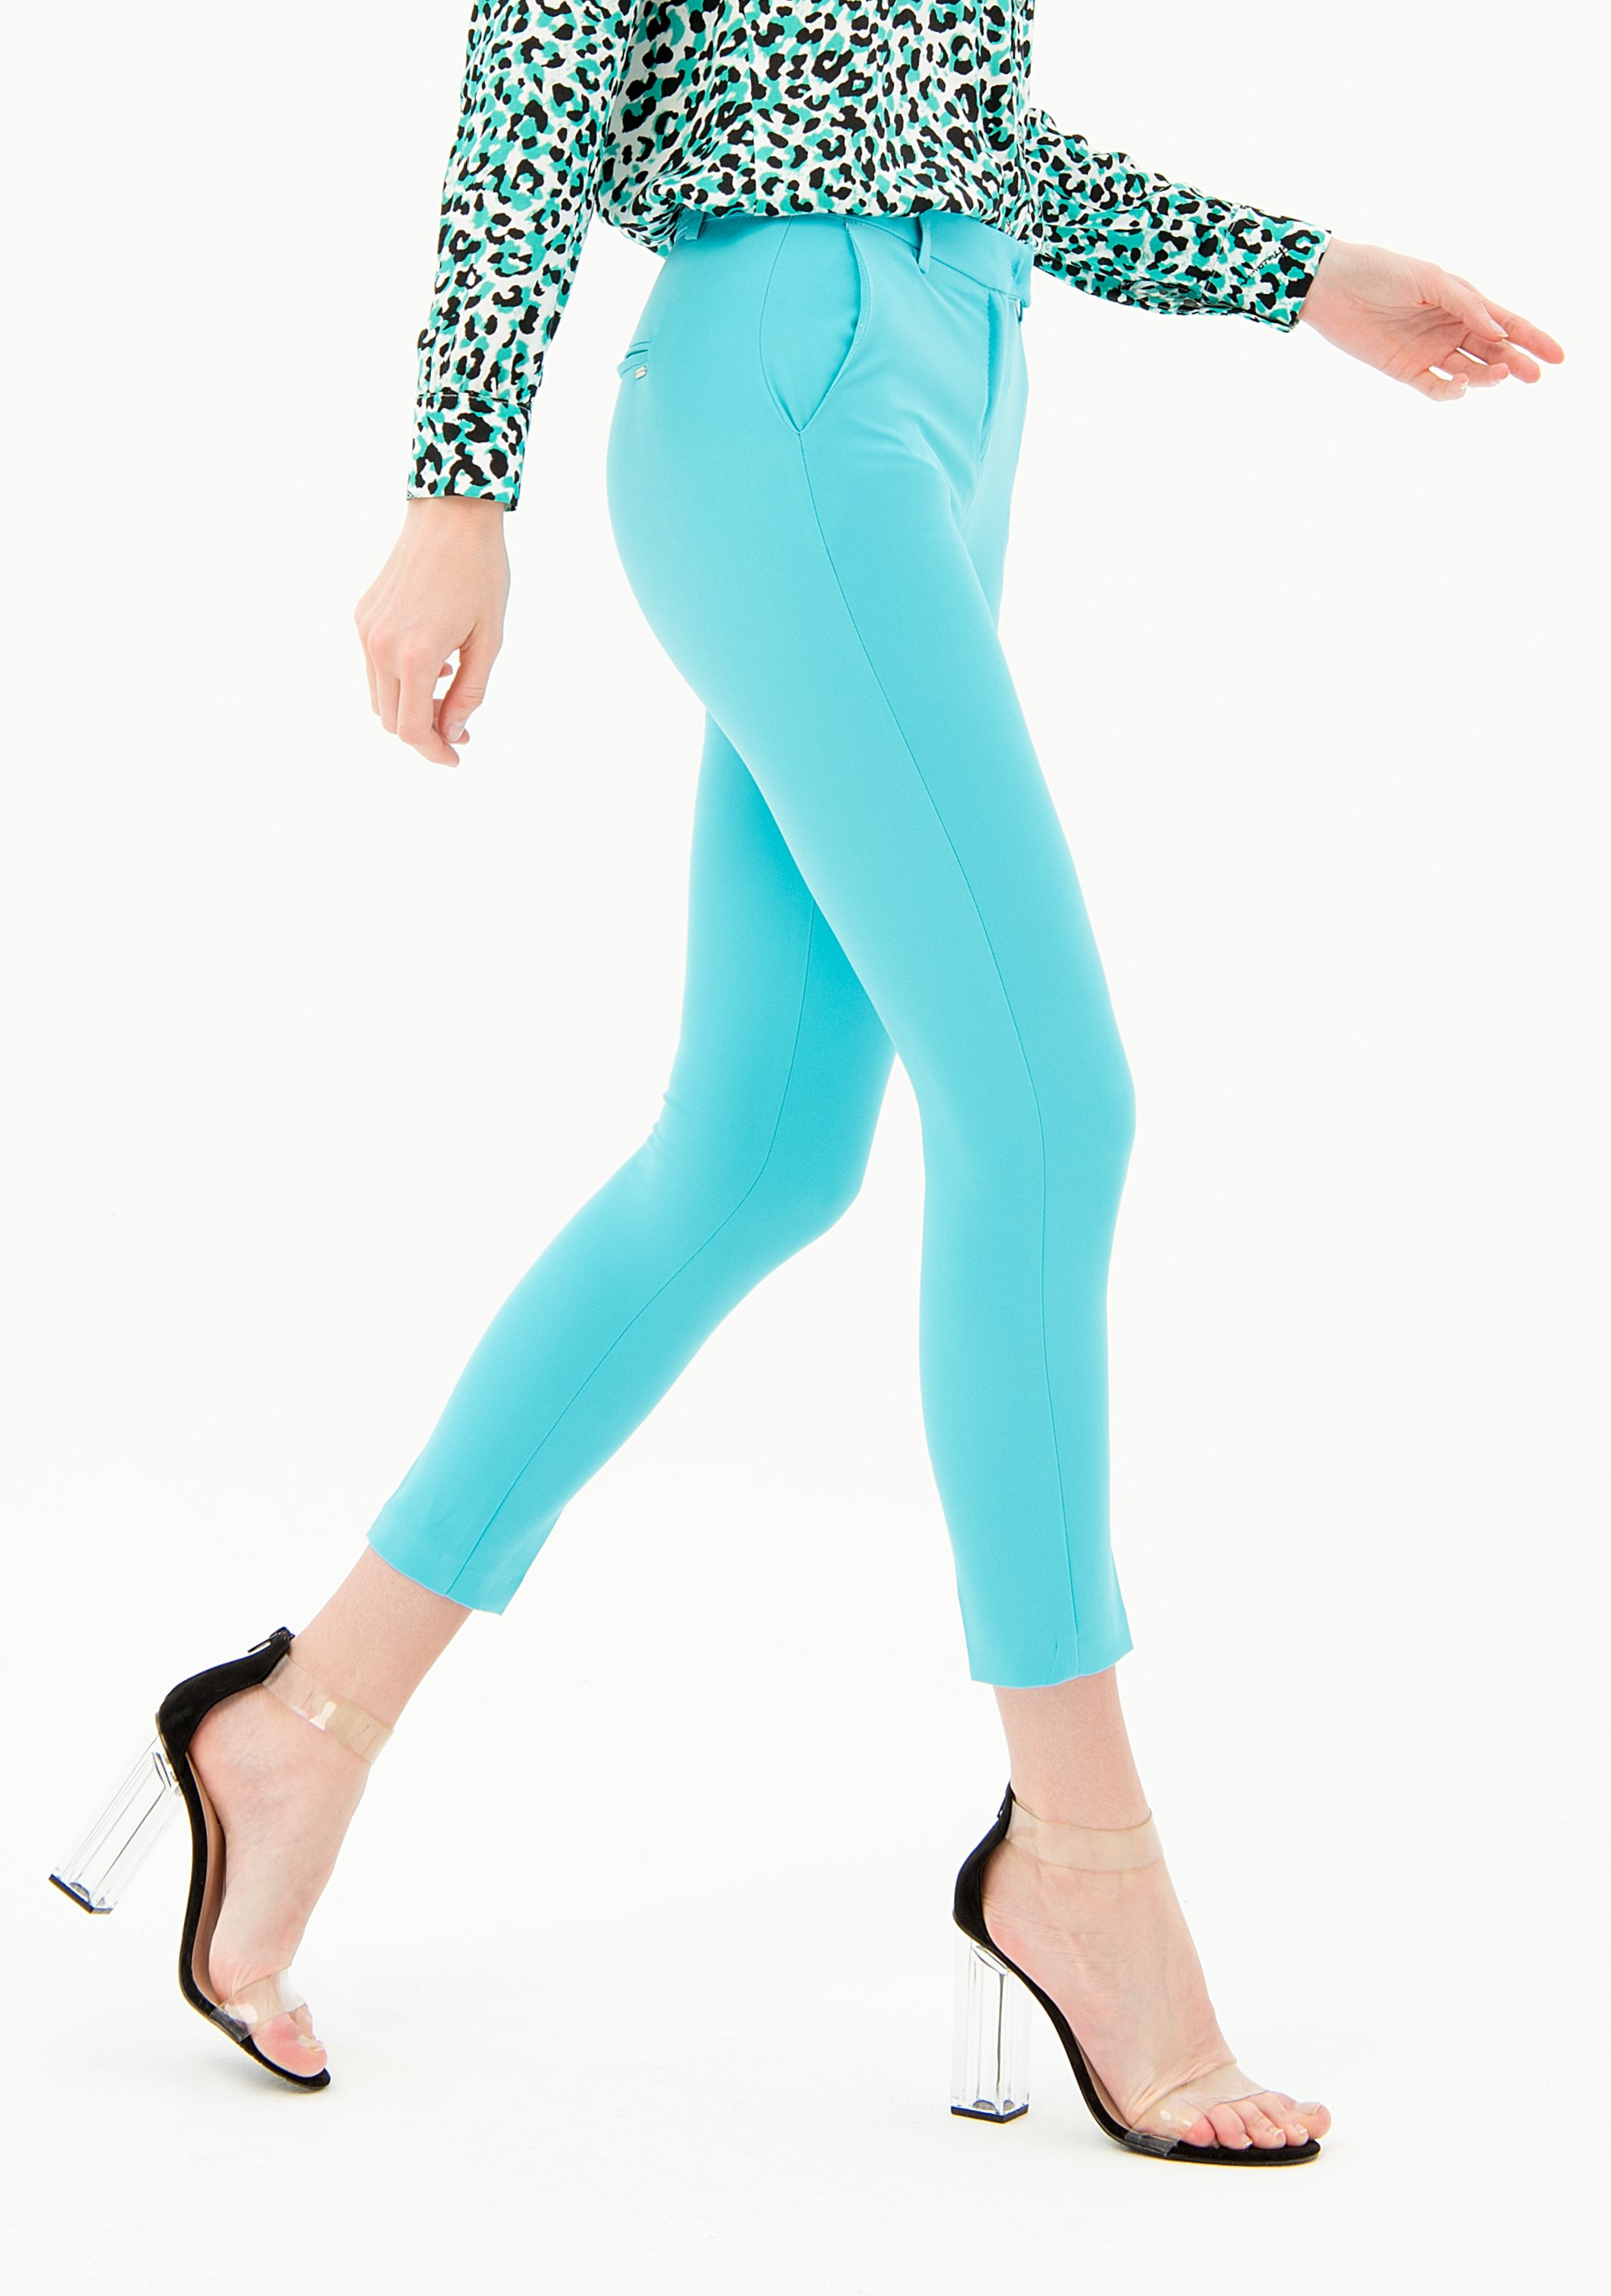 PANTALONI SKINNY DAL TAGLIO SARTORIALE FRACOMINA | Pantalone | FR21SP3006W42901268 TURQUOISE